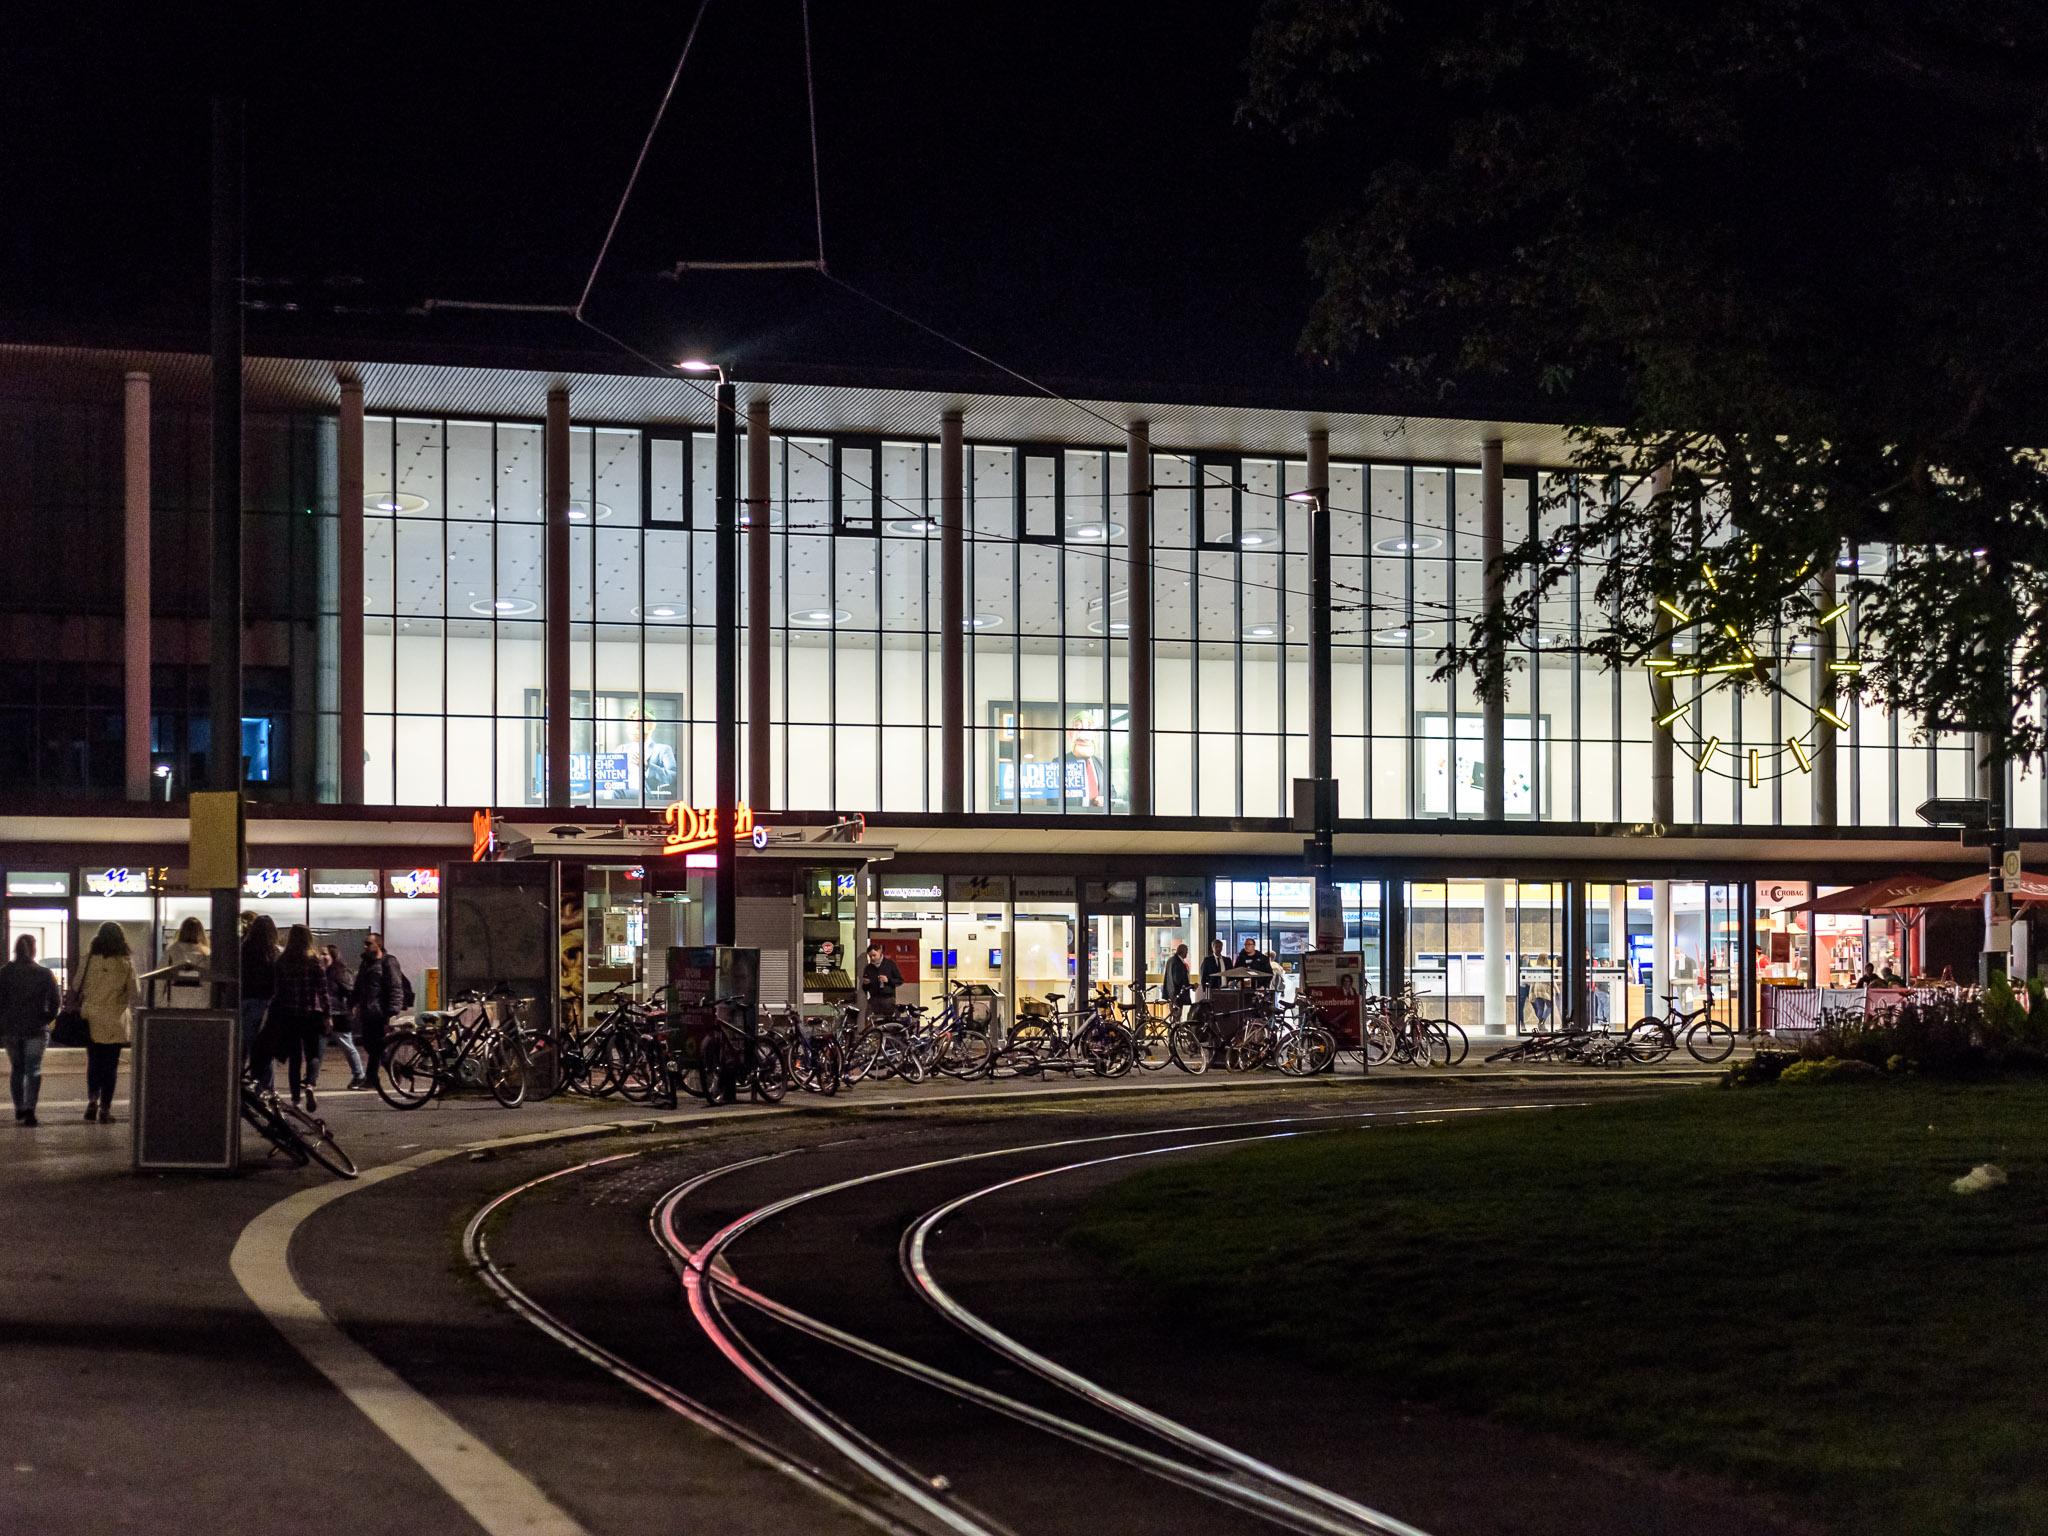 Der Hauptbahnhof Würzburg am Abend. Foto: Pascal Höfig